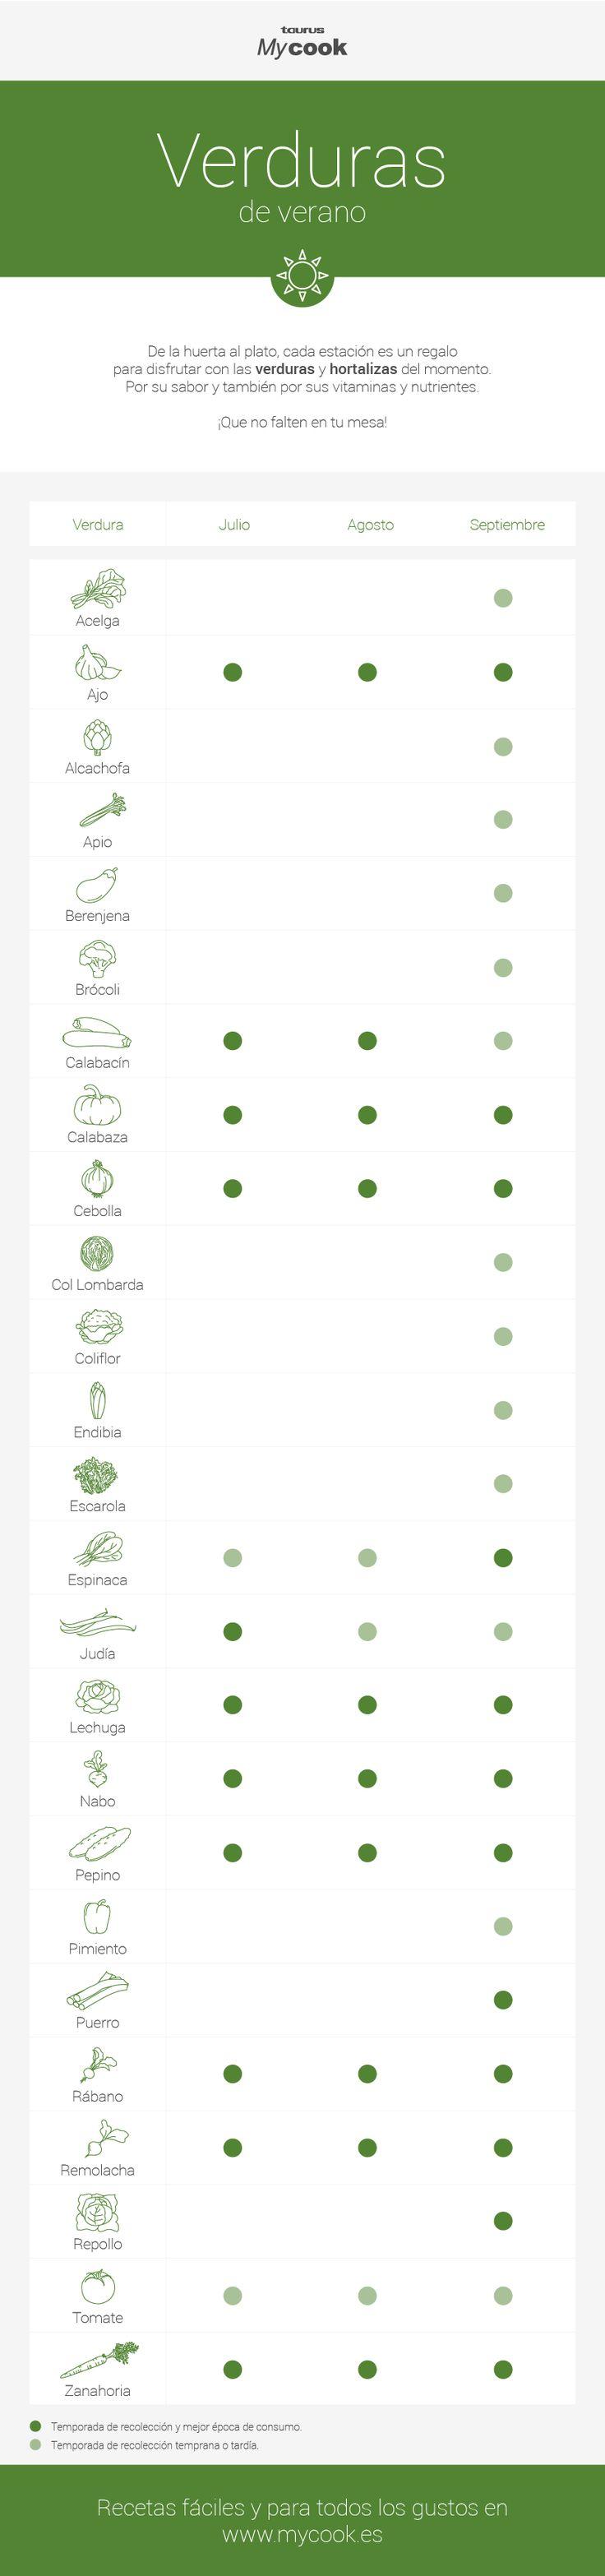 taurus-mycook-infografia-temporada-verduras-verano